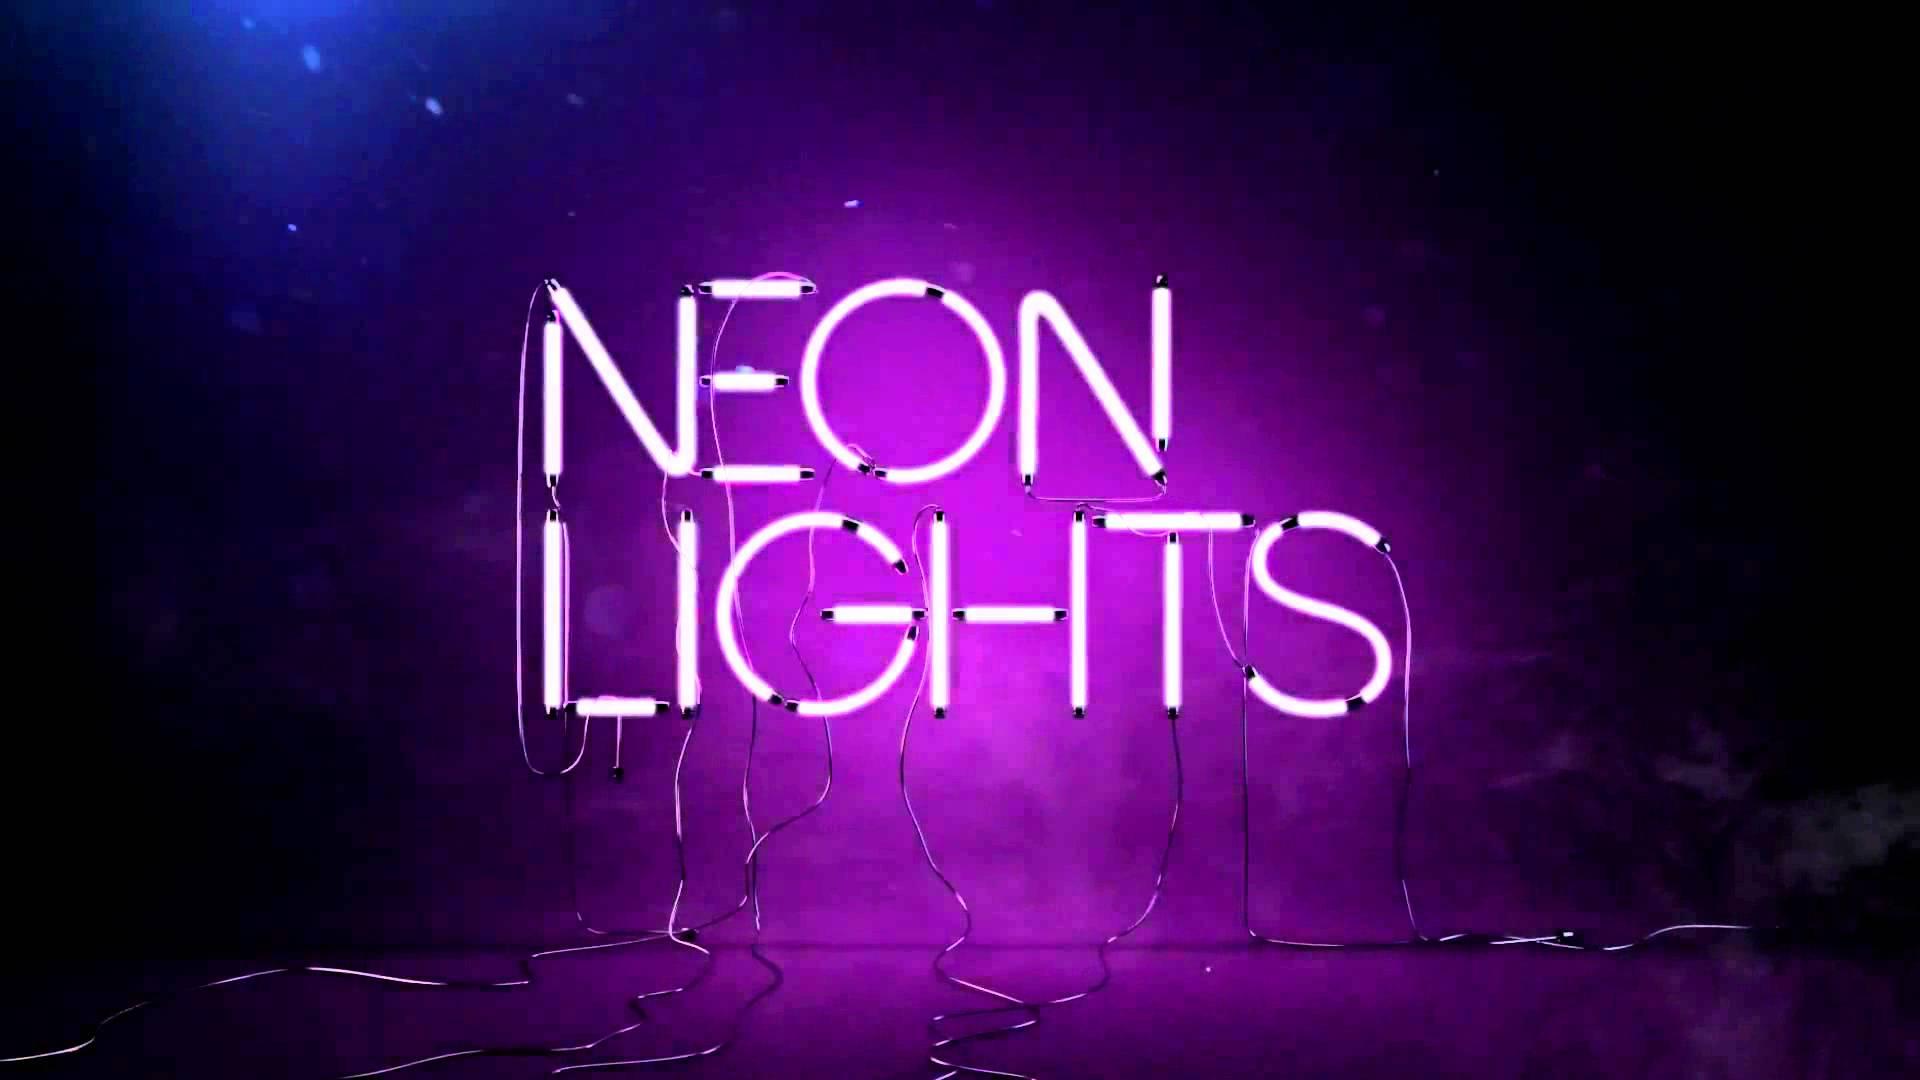 Popular Wallpaper Name Kiran - neon-lights-wide  Gallery_511434.jpg